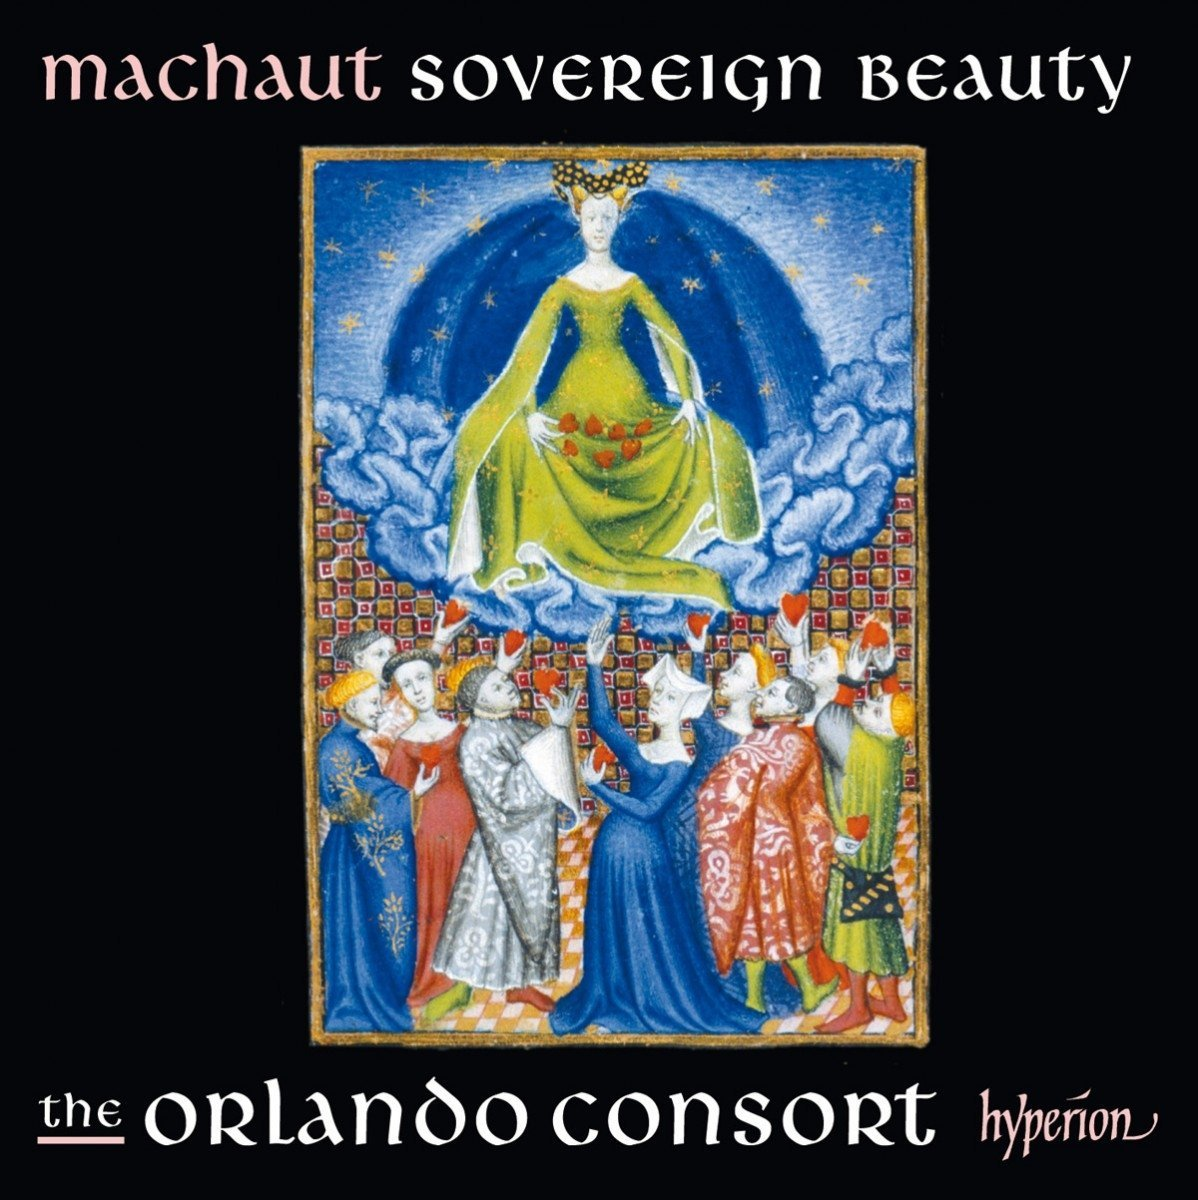 Machaut, Sovereign Beauty